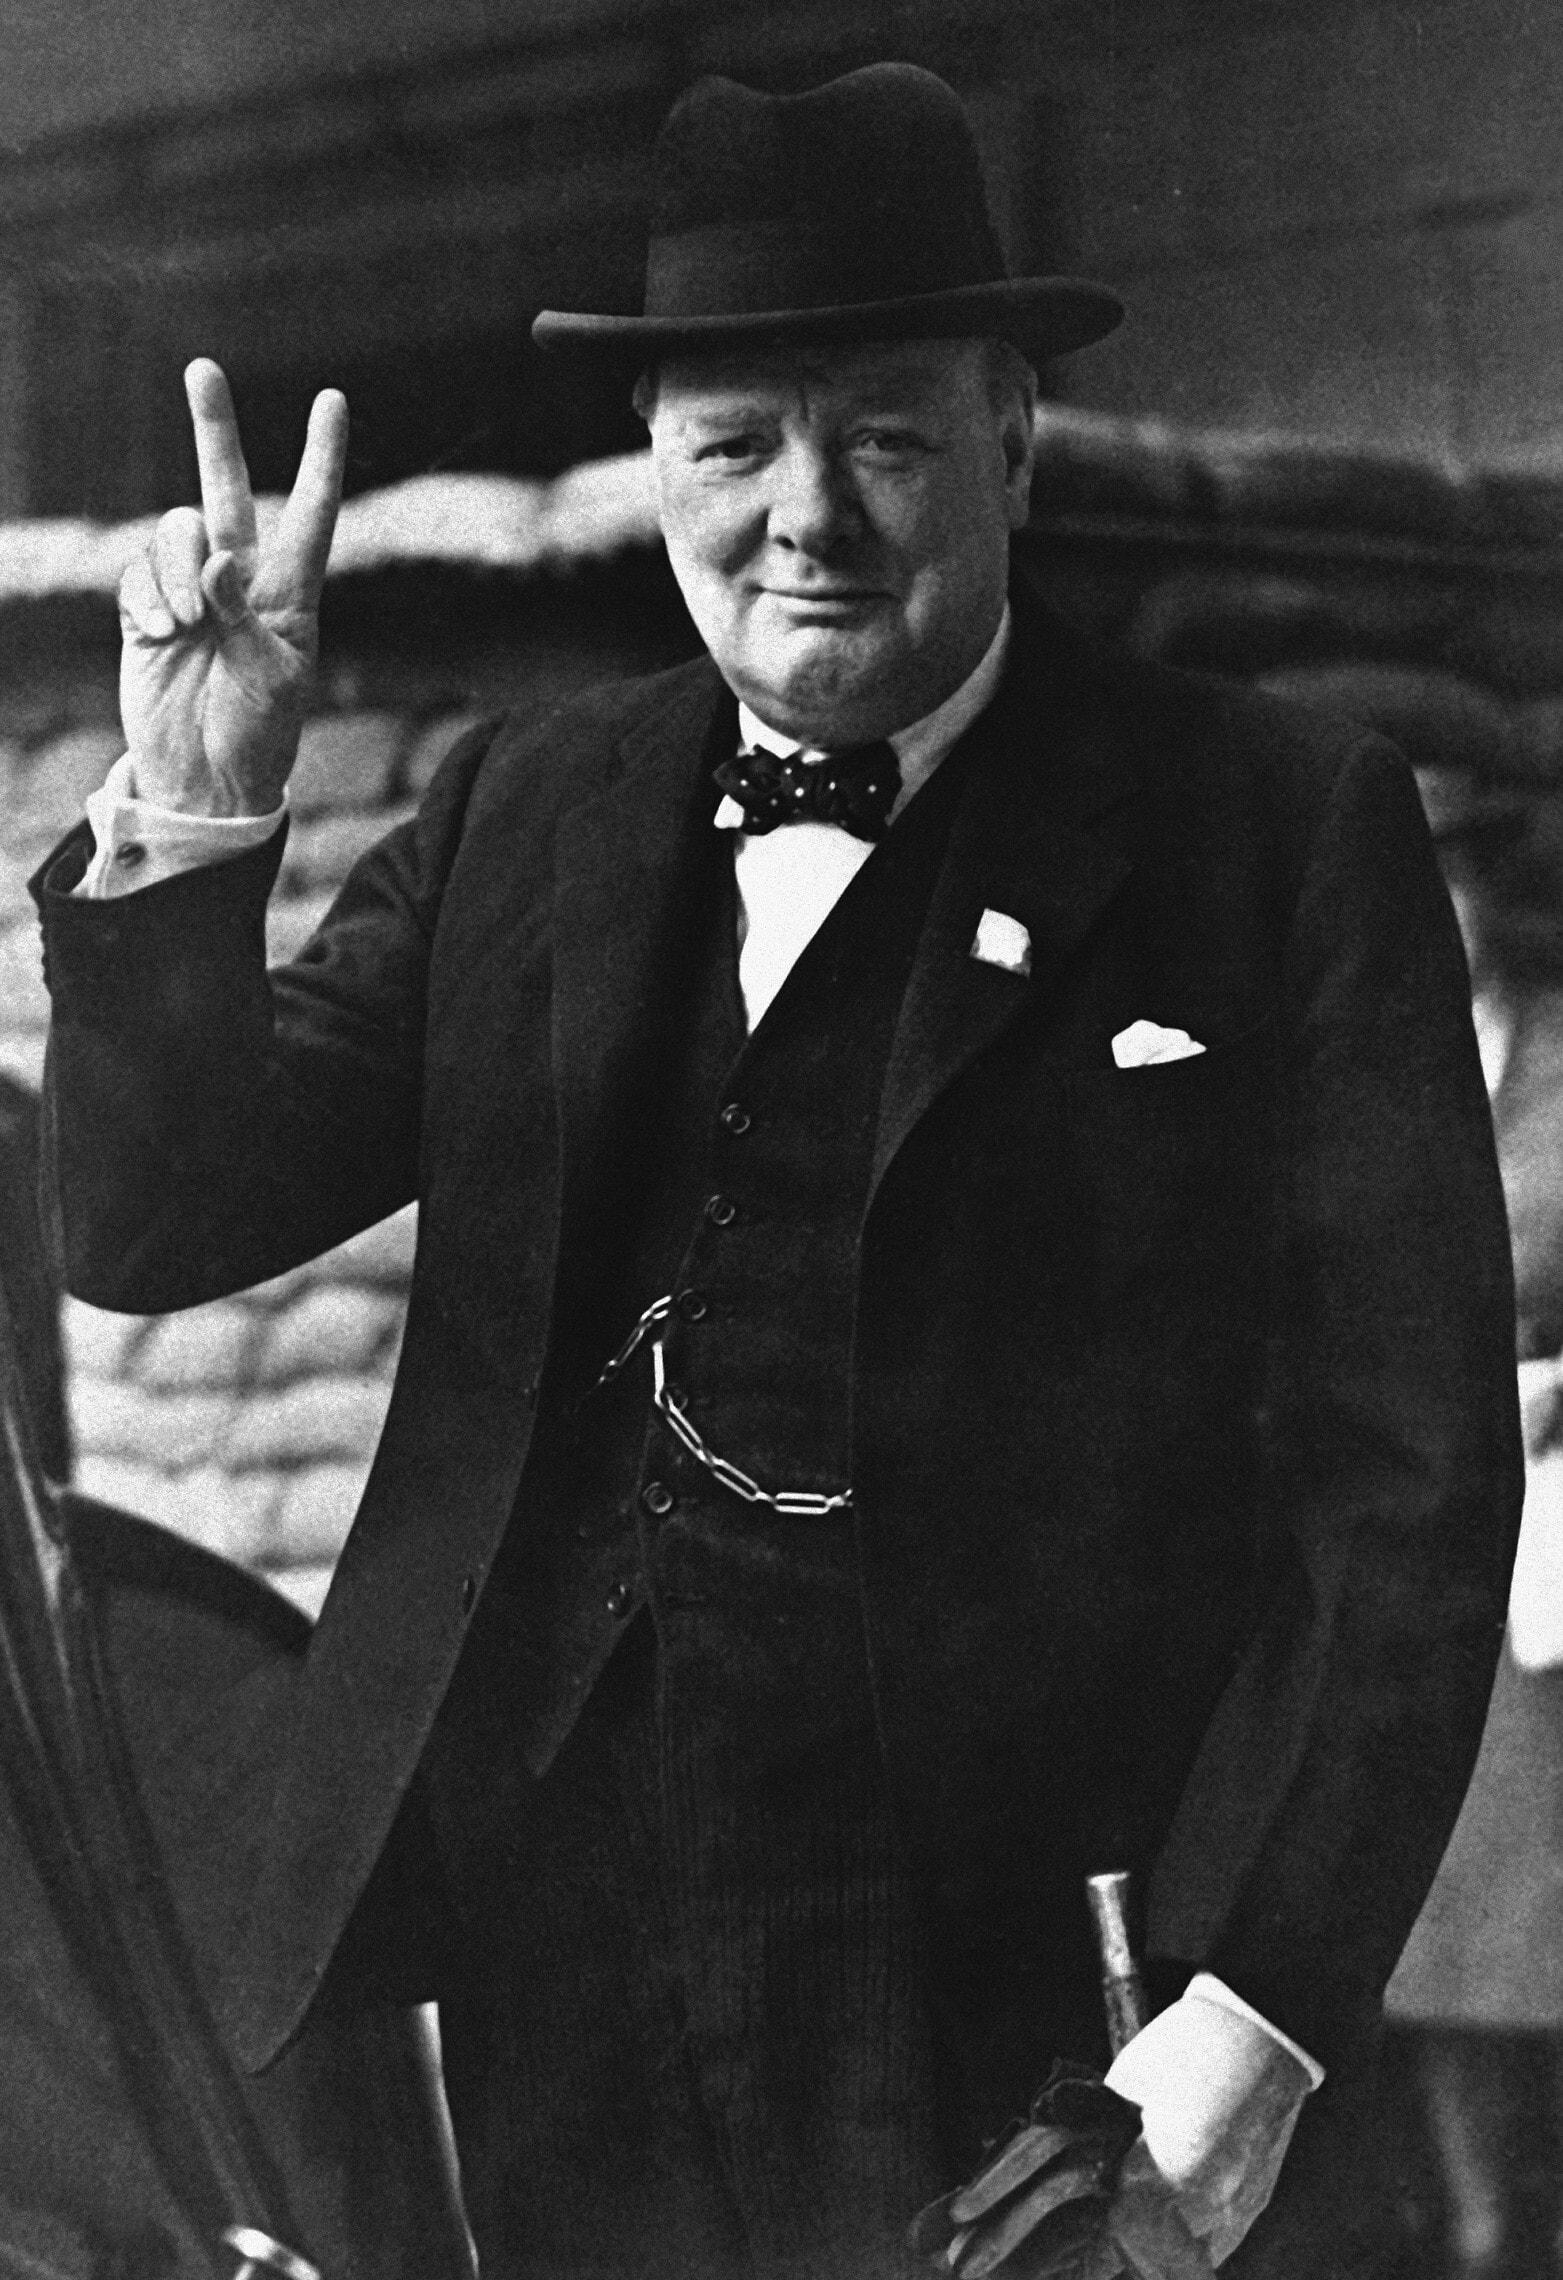 וינסטון צ'רצ'יל, אוגוסט 1941 (צילום: AP Photo)